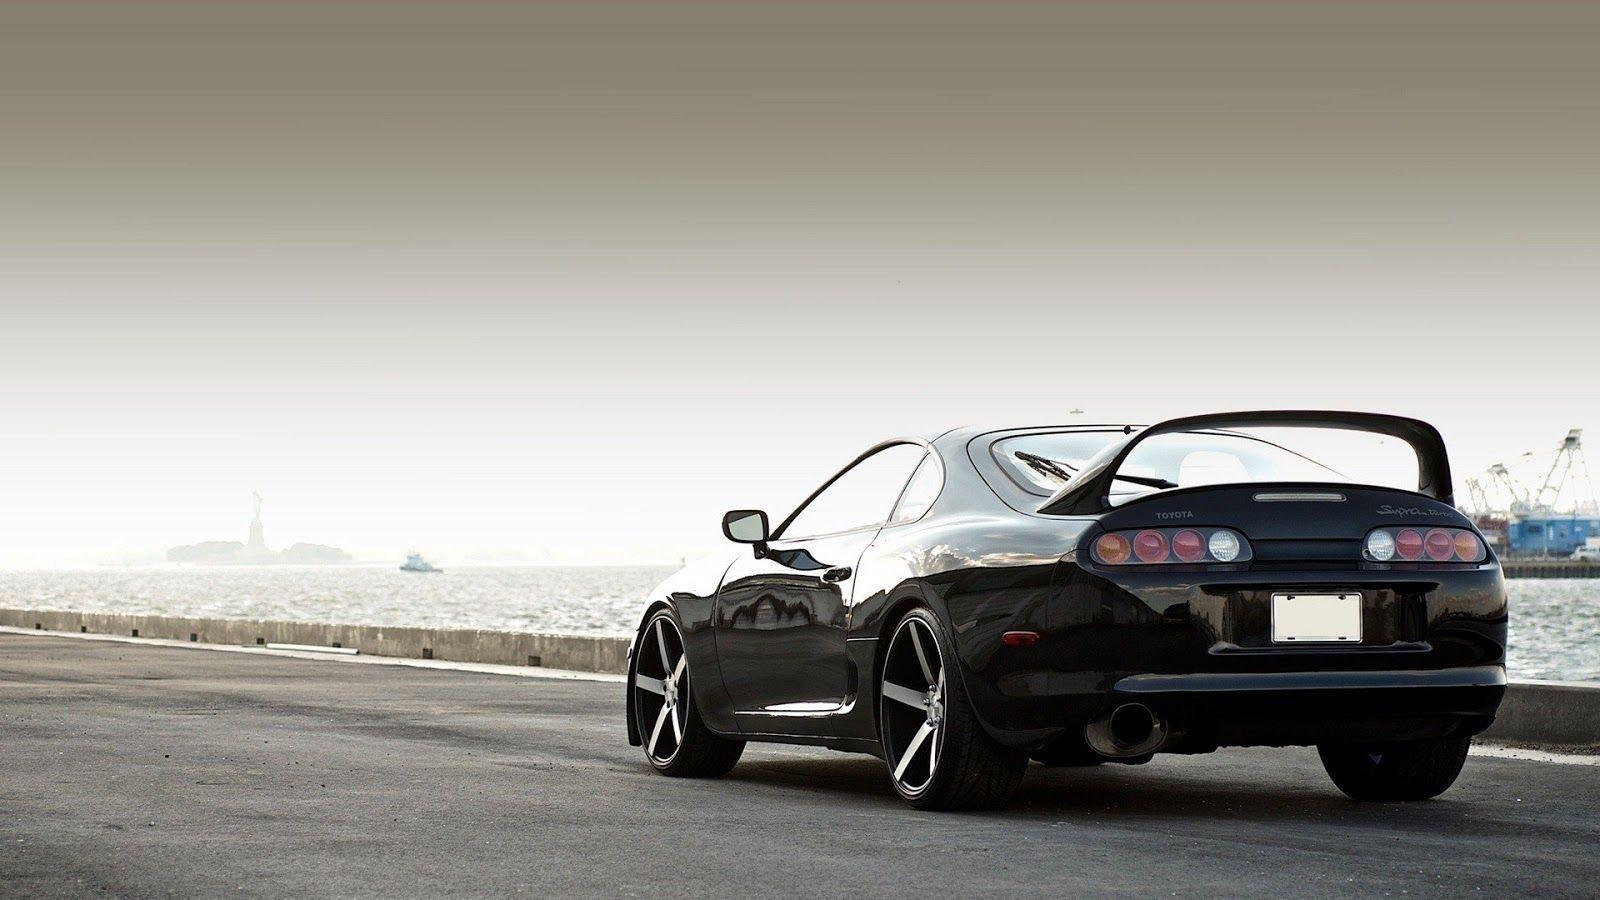 The Best Toyota Supra Wallpaper Hd Background